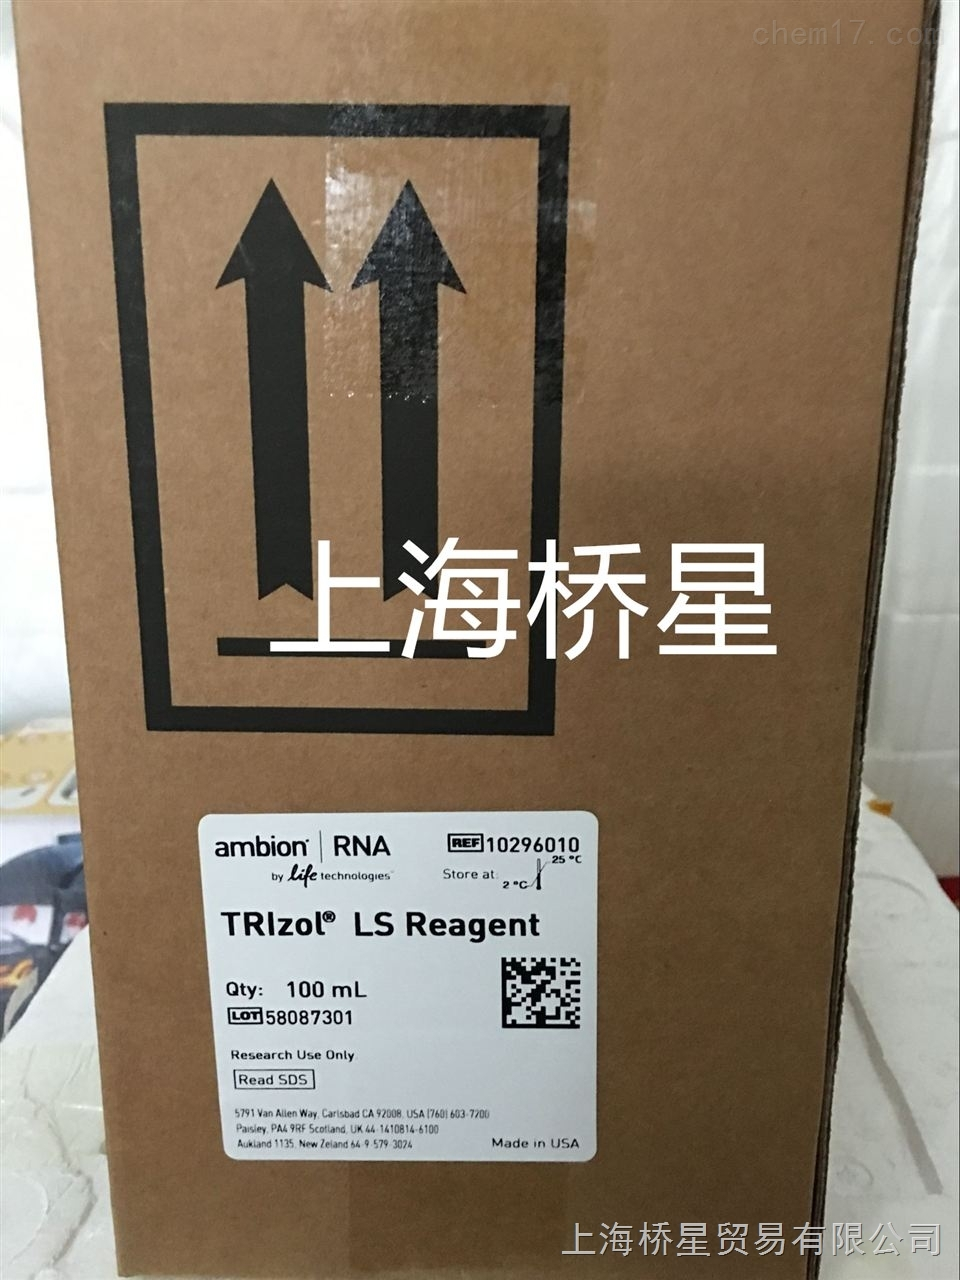 Trizol LS Reagent 100ml Gibco试剂